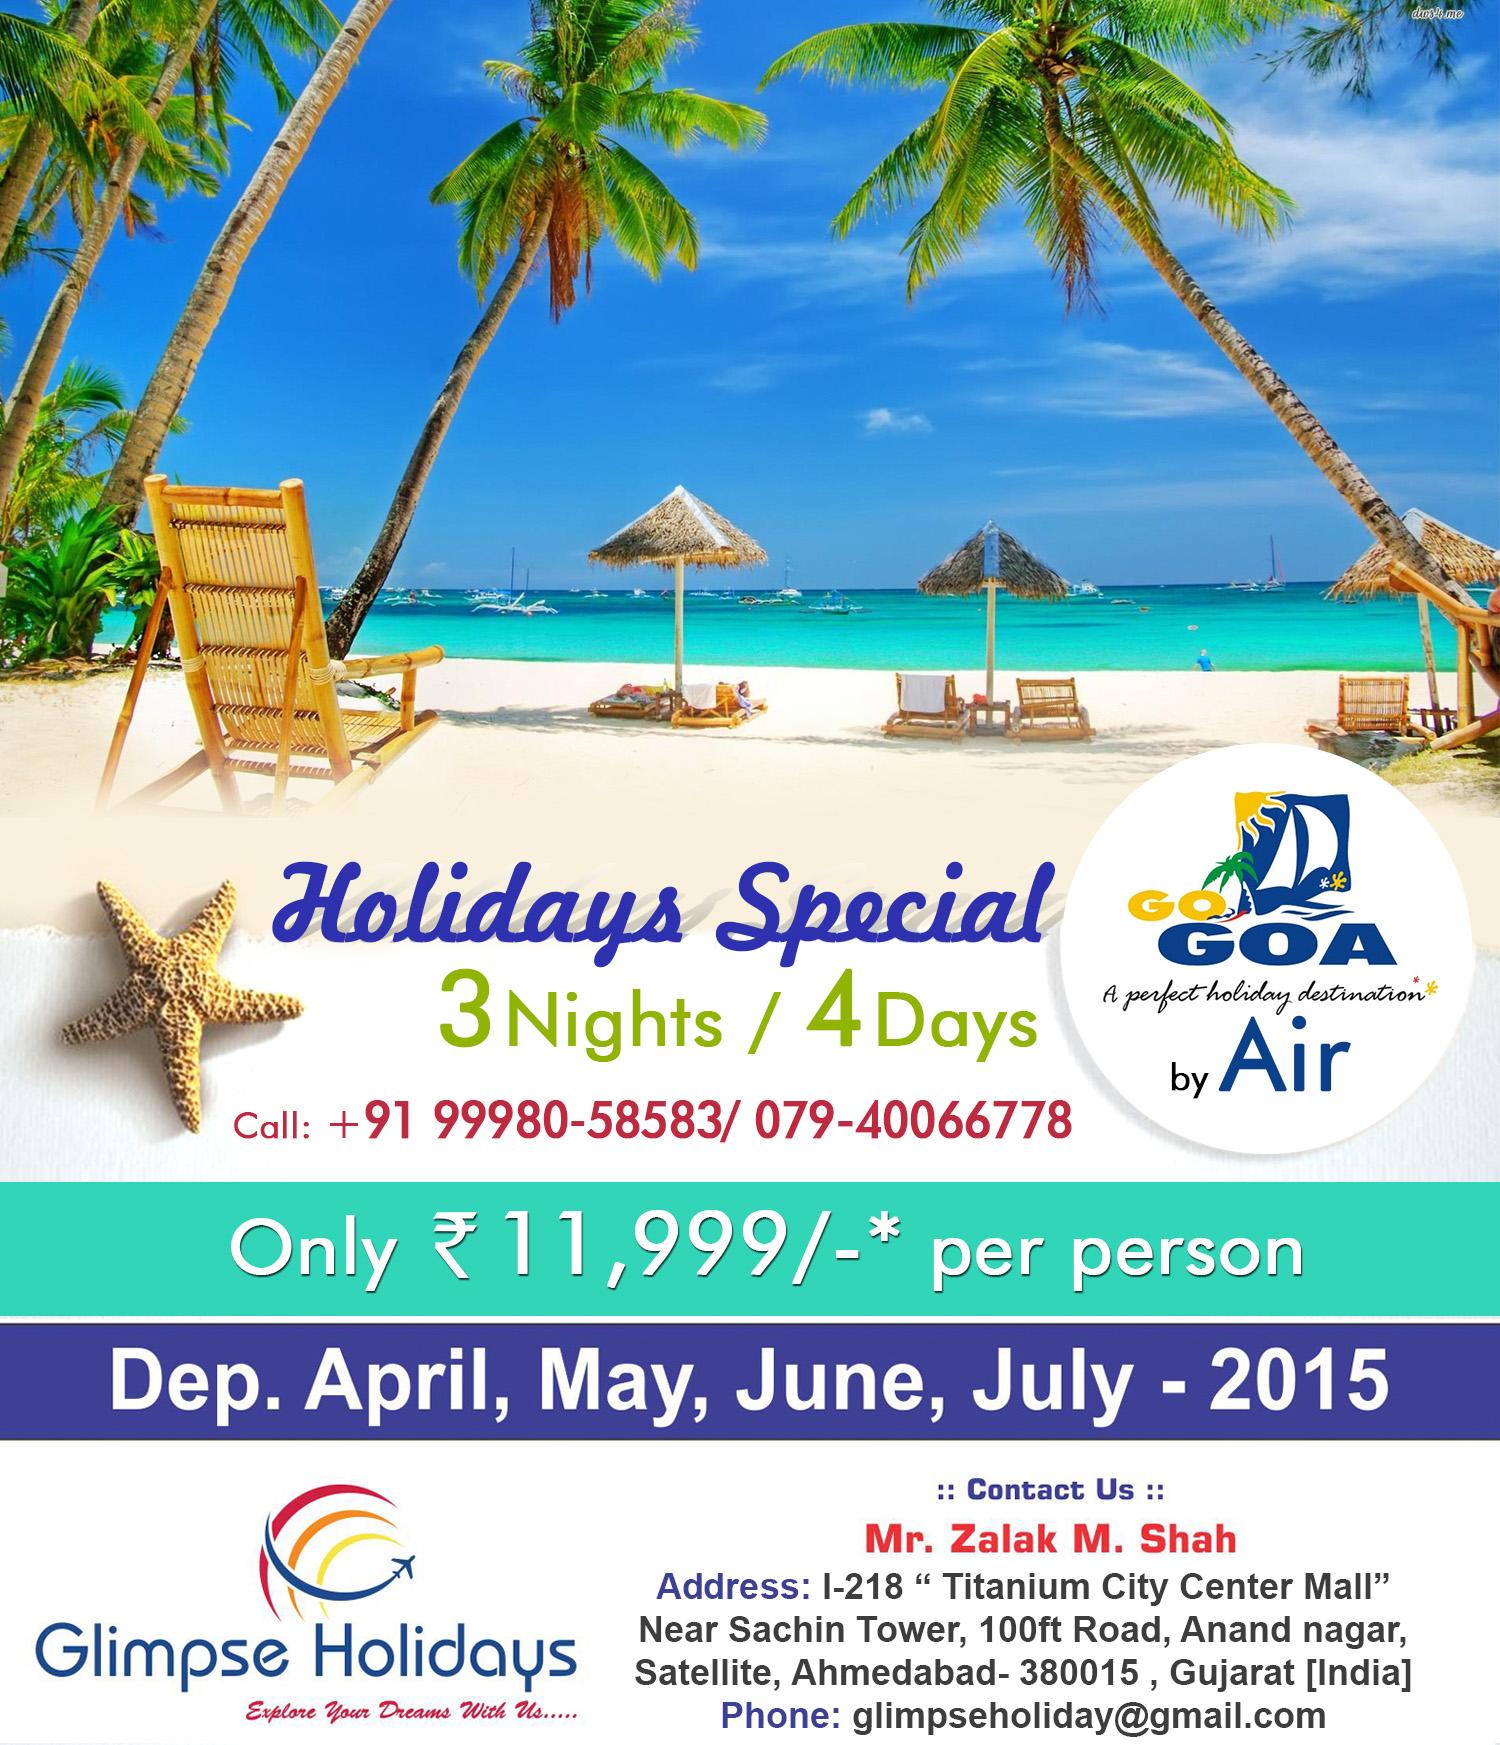 Go goa with Glimpse Holidays!